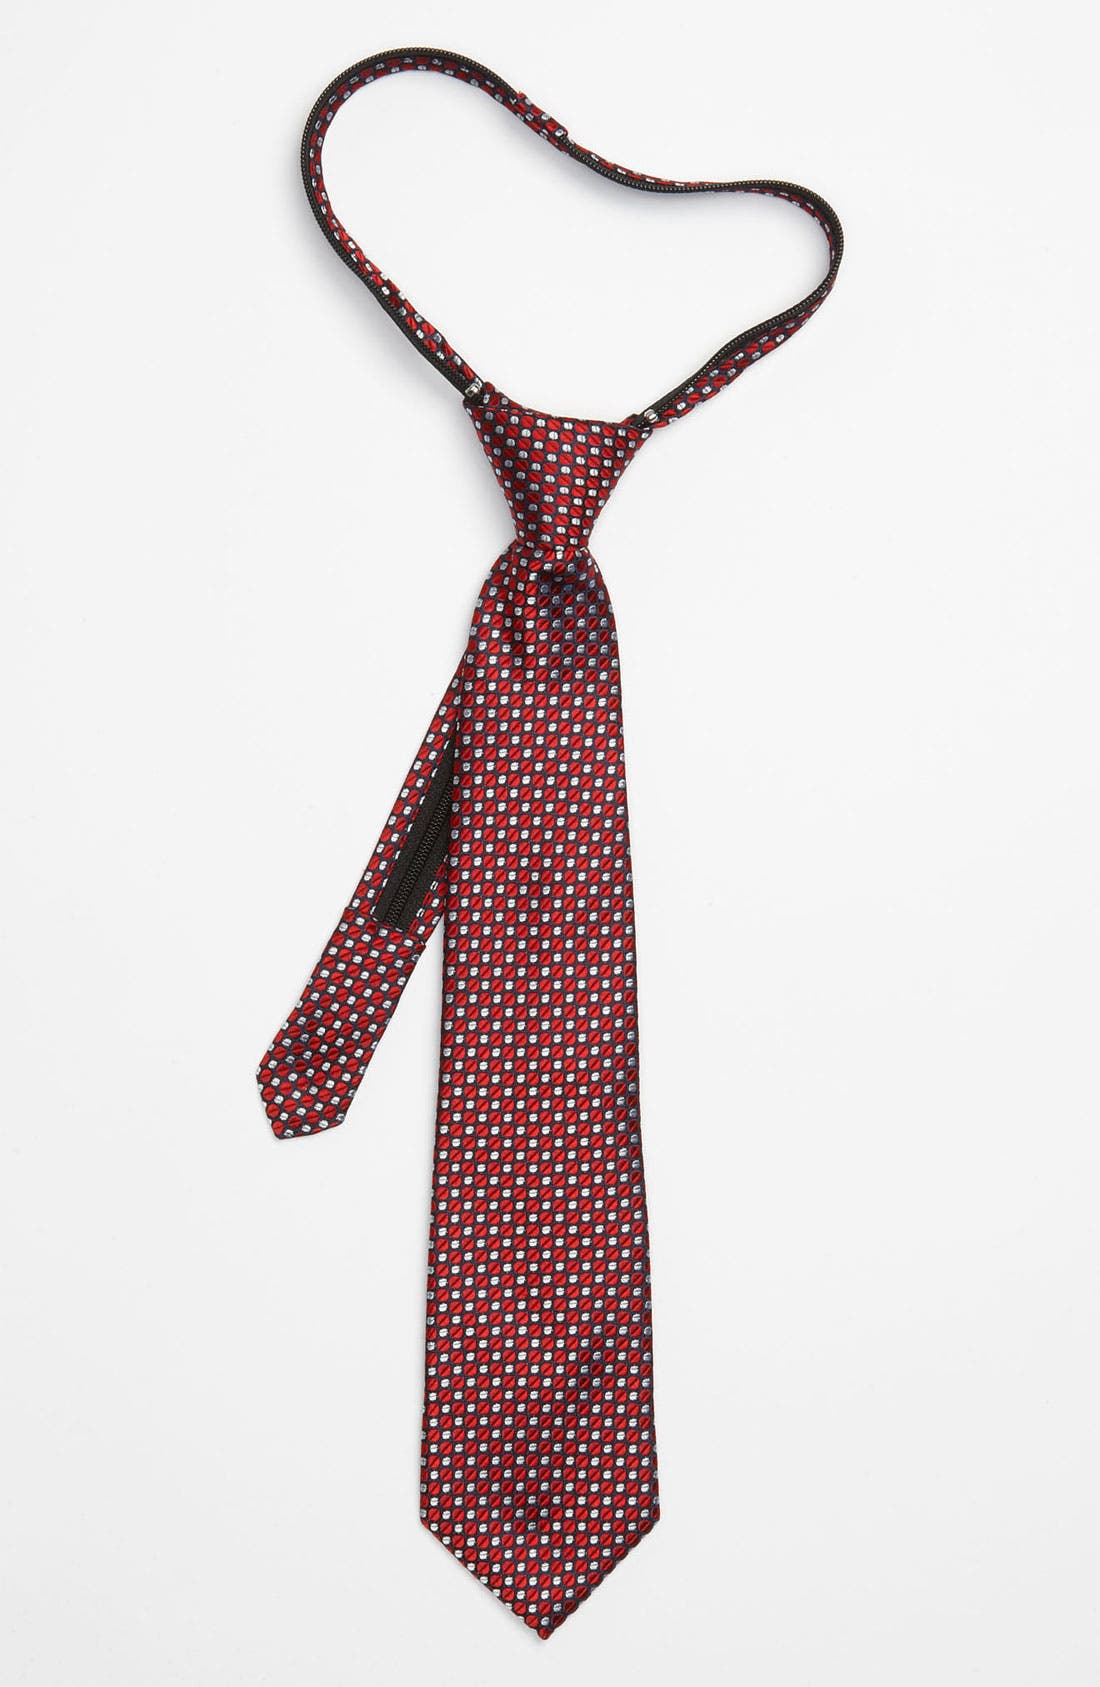 Alternate Image 1 Selected - Nordstrom Zipper Tie (Little Boys)